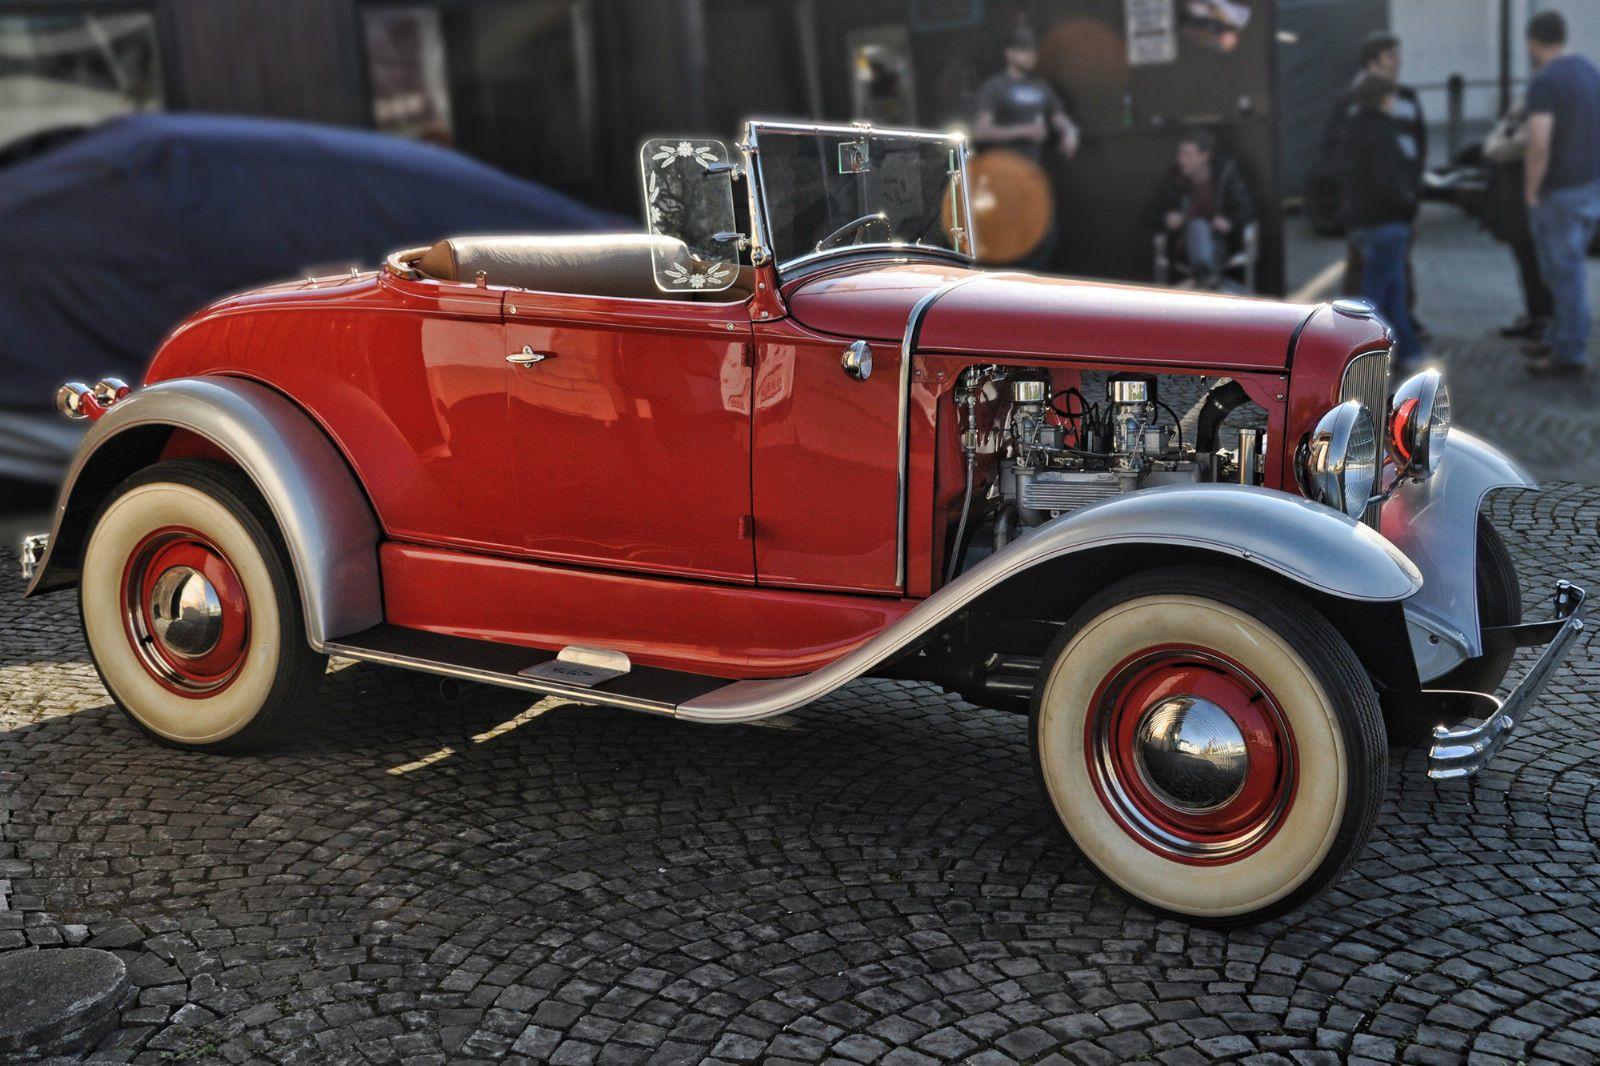 Ford (USA) Roadster 2S Cabriolet 1931 in Auto & Motorrad: Fahrzeuge ...